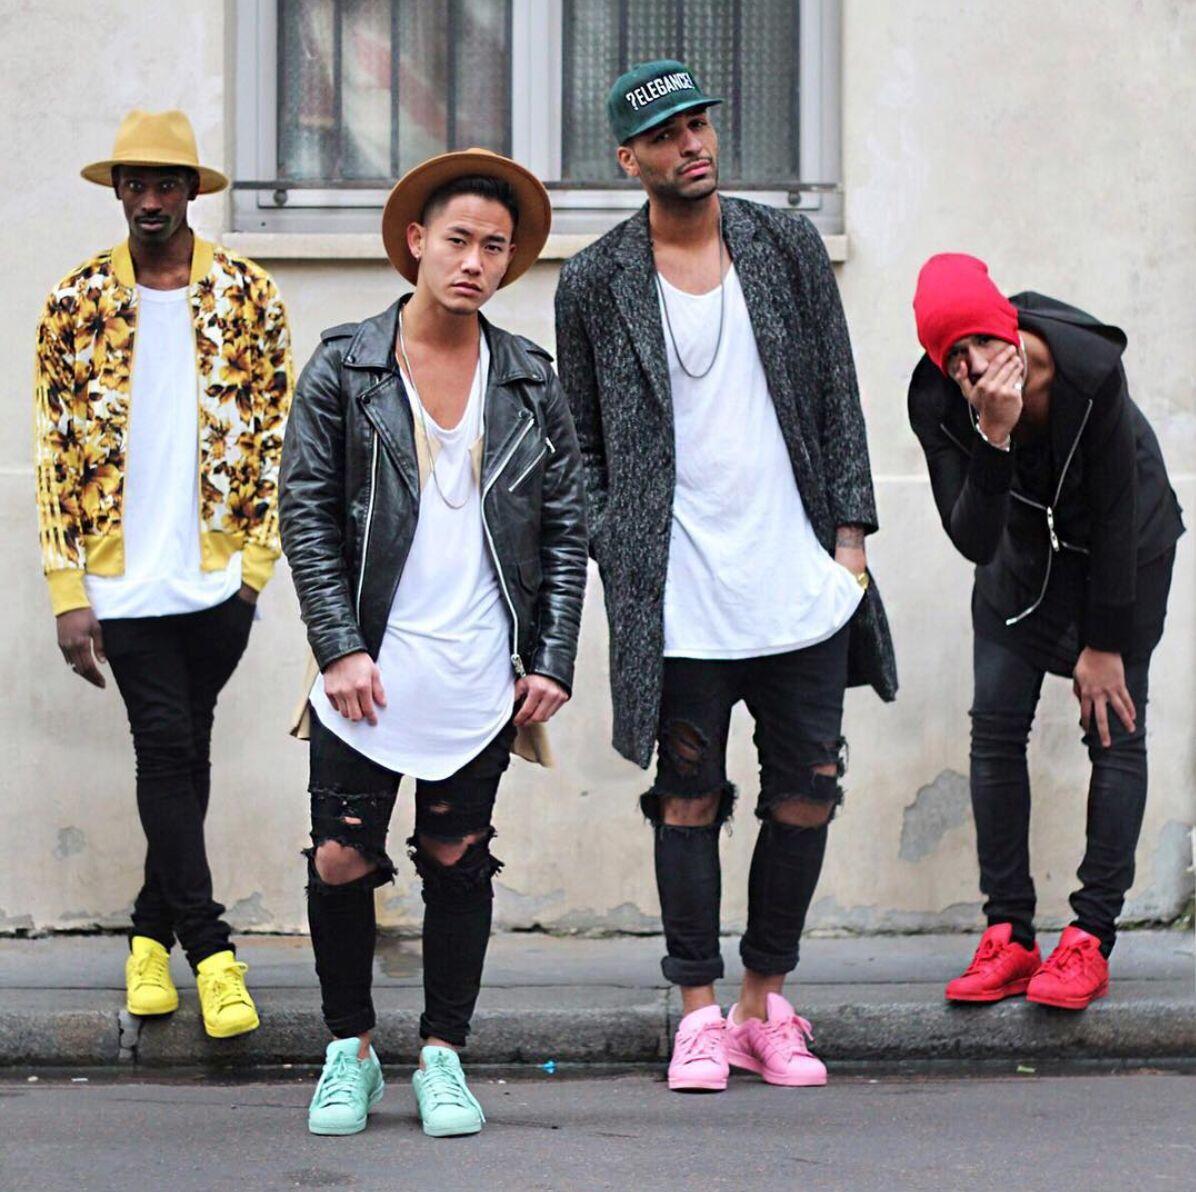 Estilos streetwear rock, hiphop y skate